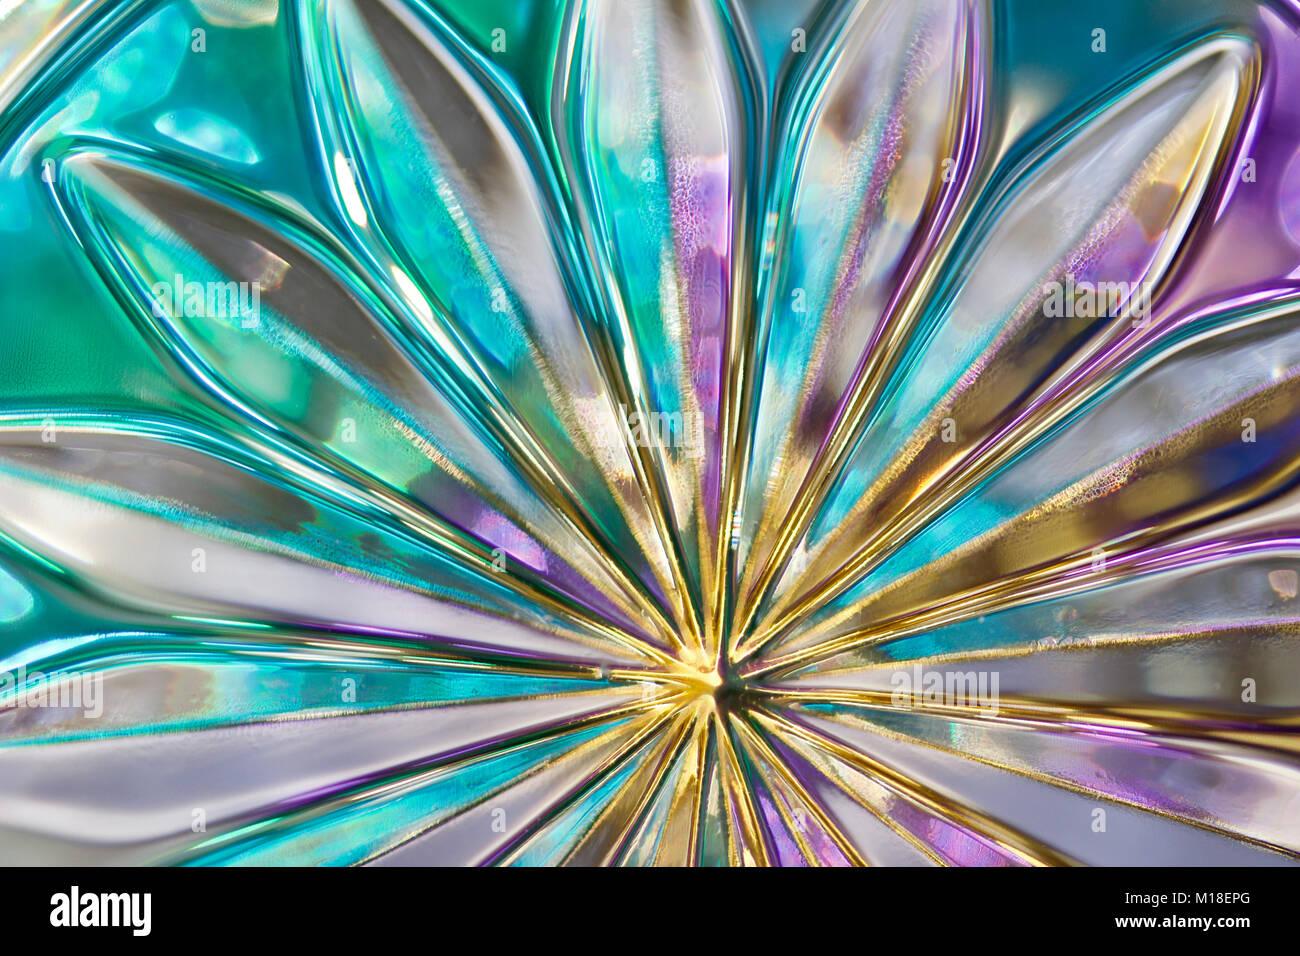 Abstract Art Crystal